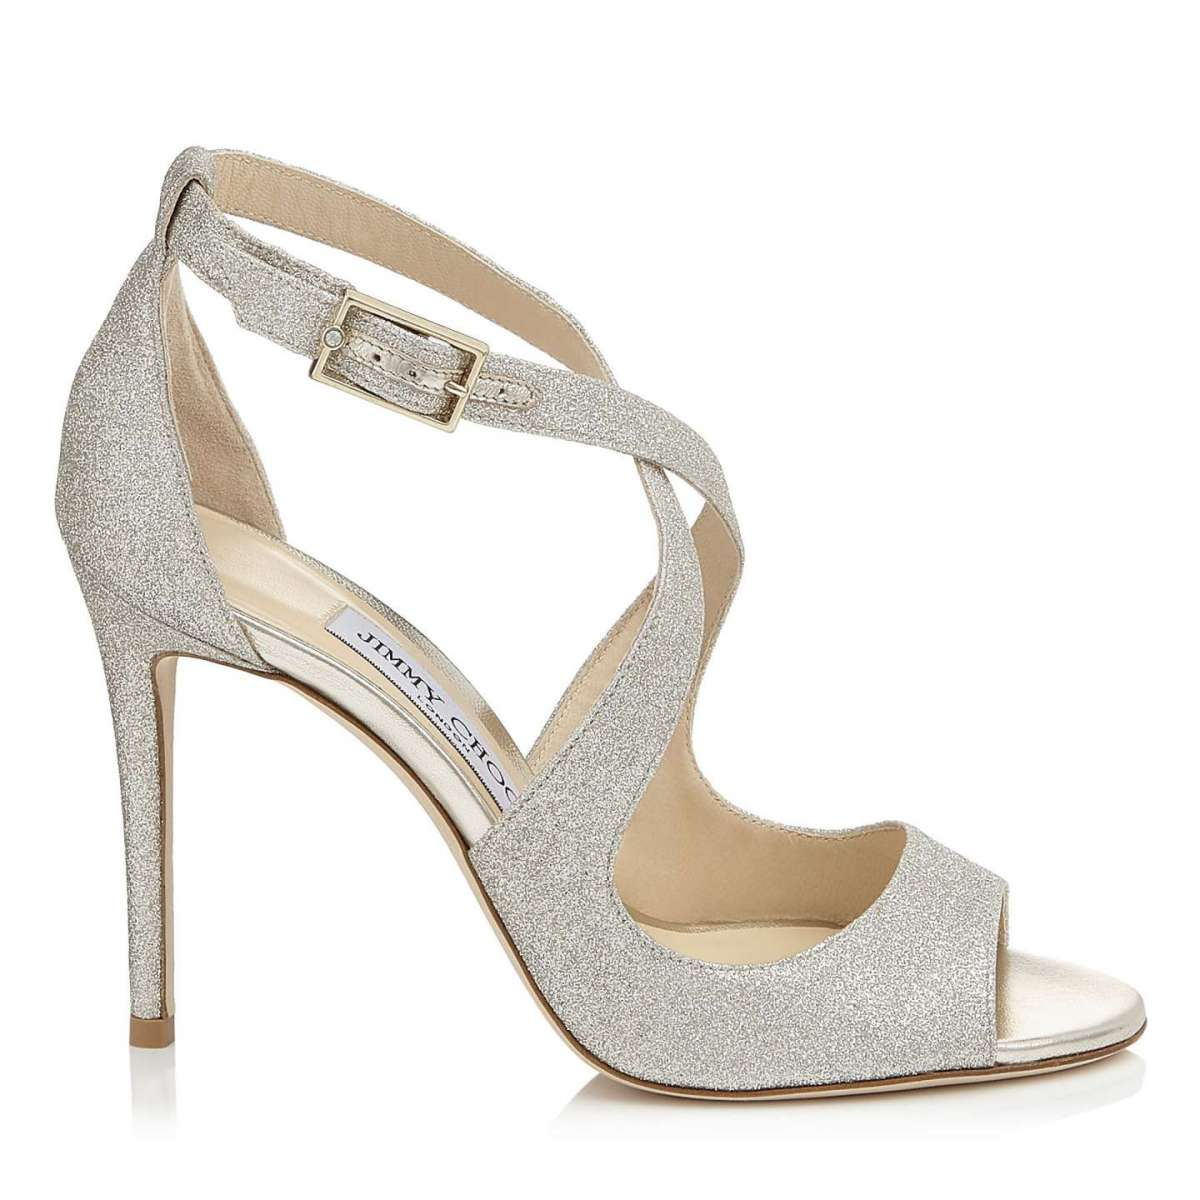 Sandali da sposa grigio perla Jimmy Choo